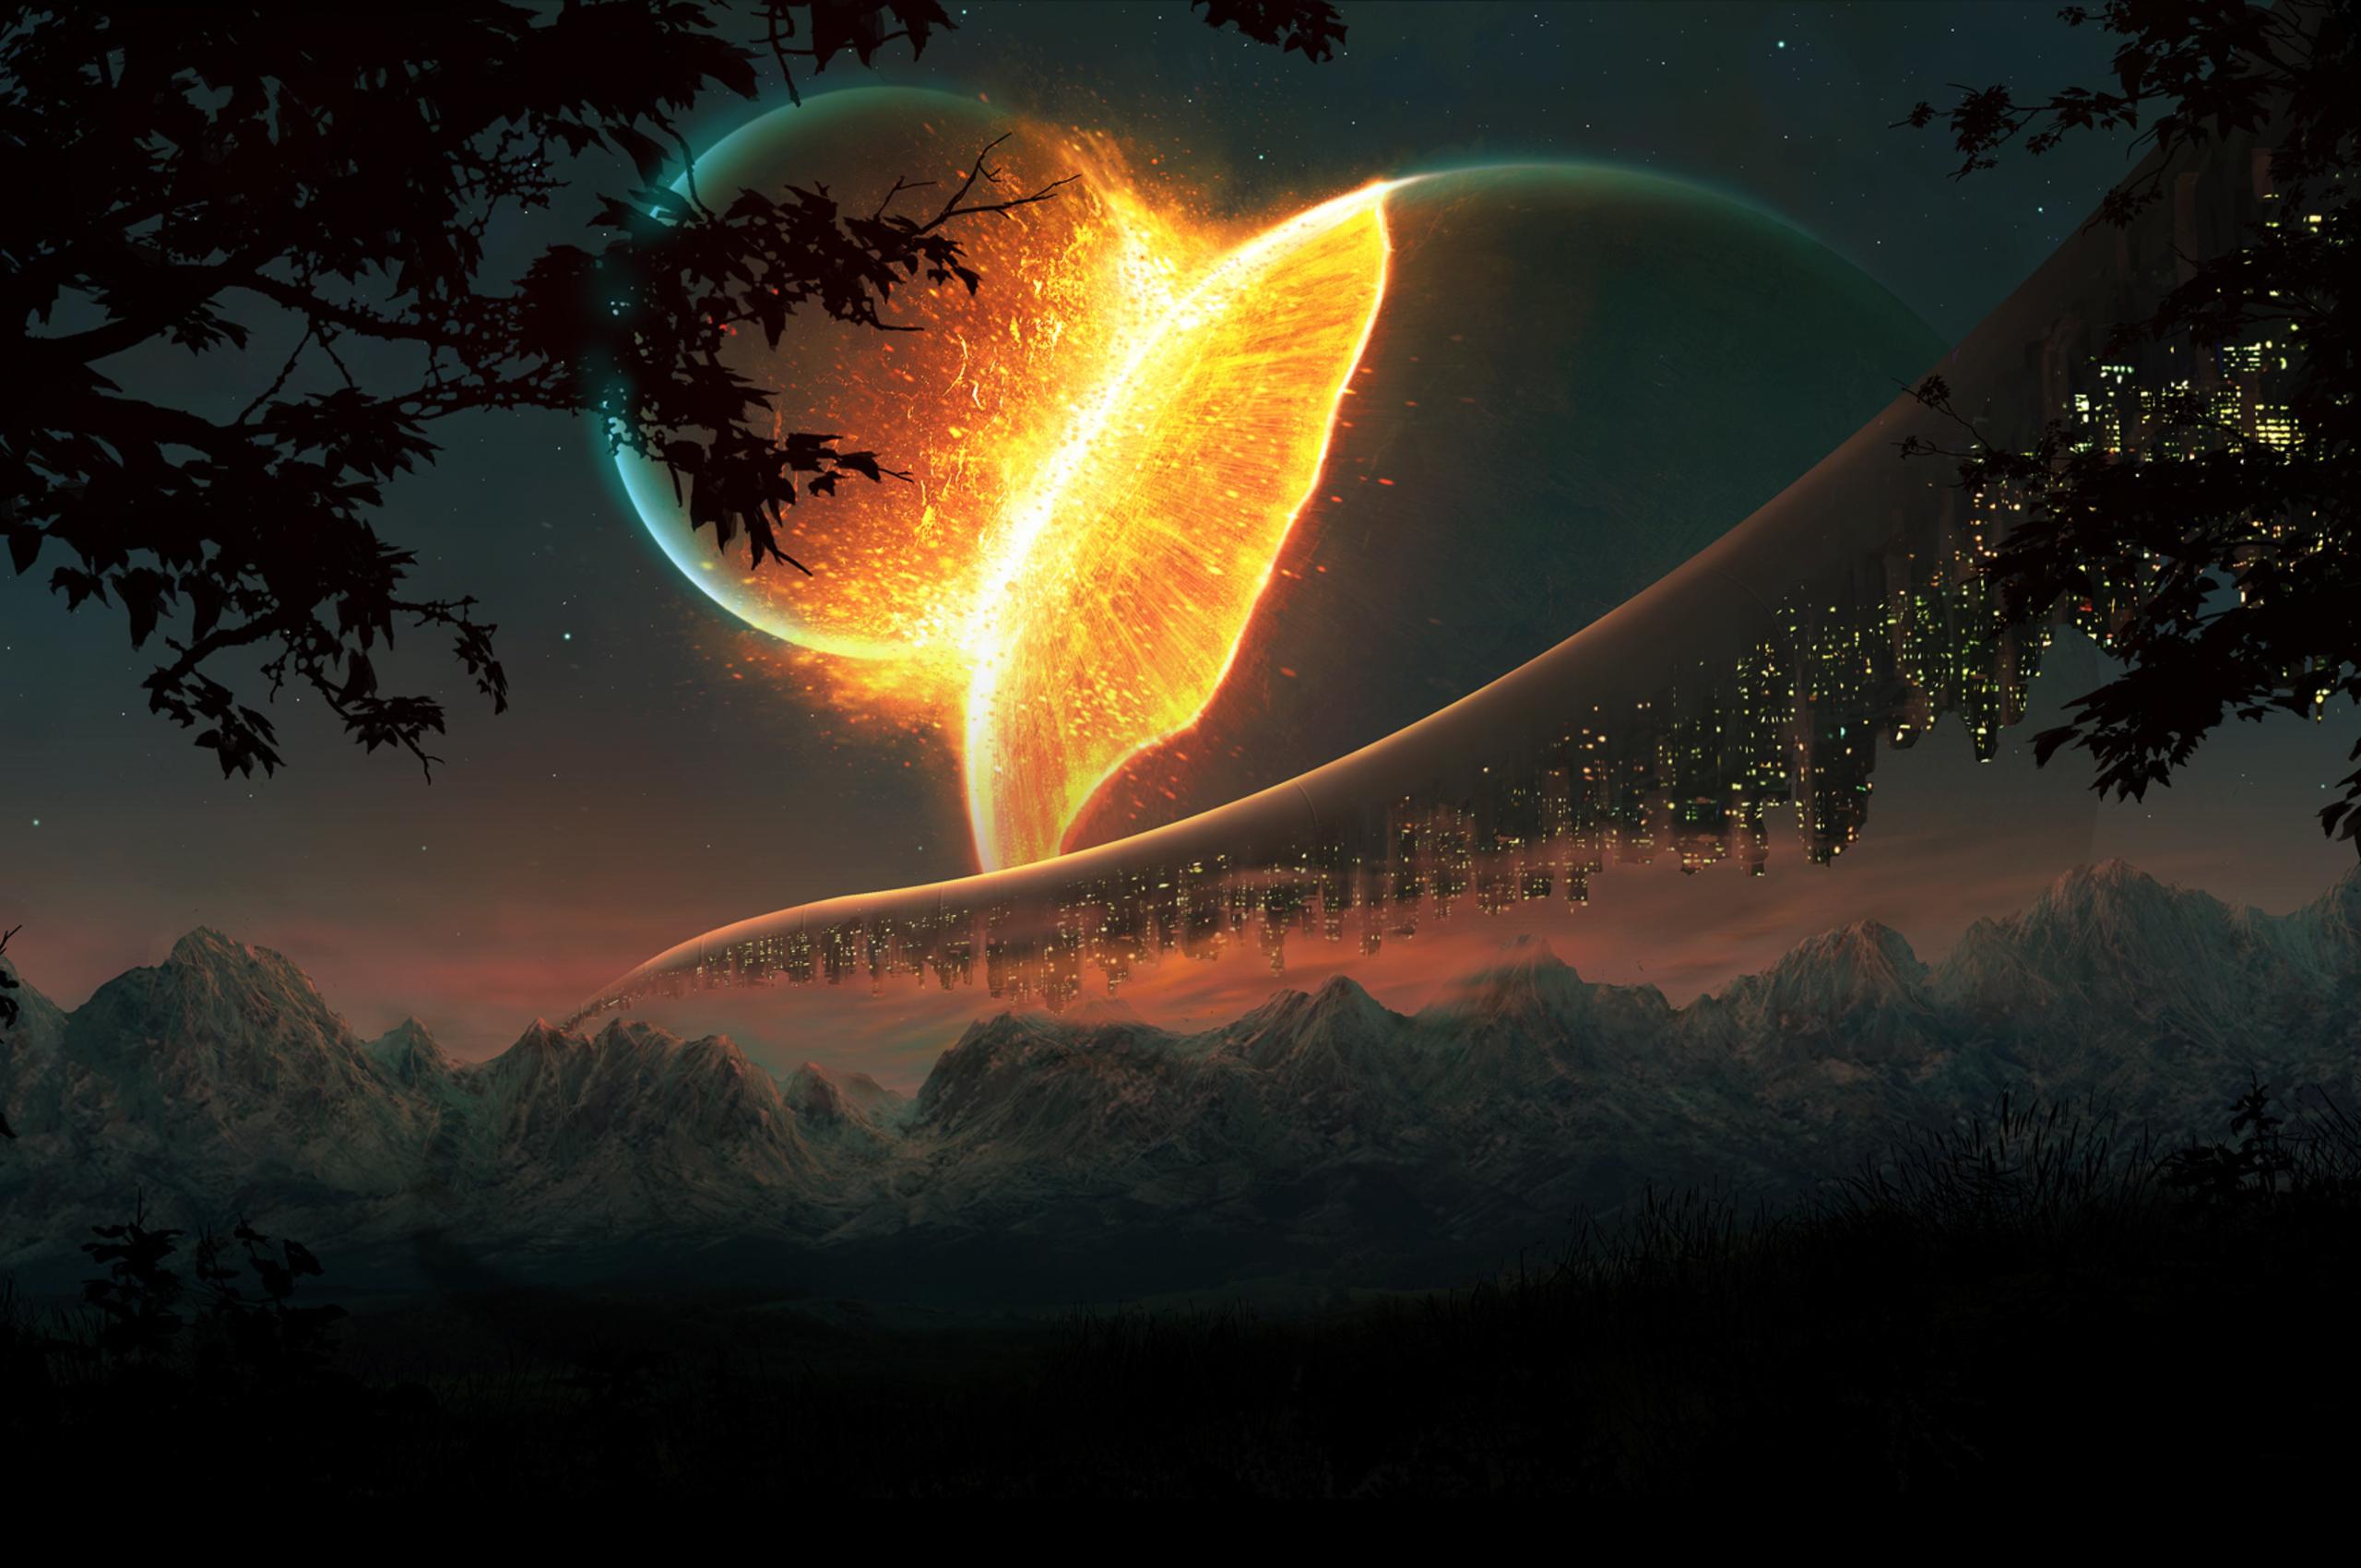 sciene-fiction-pic.jpg